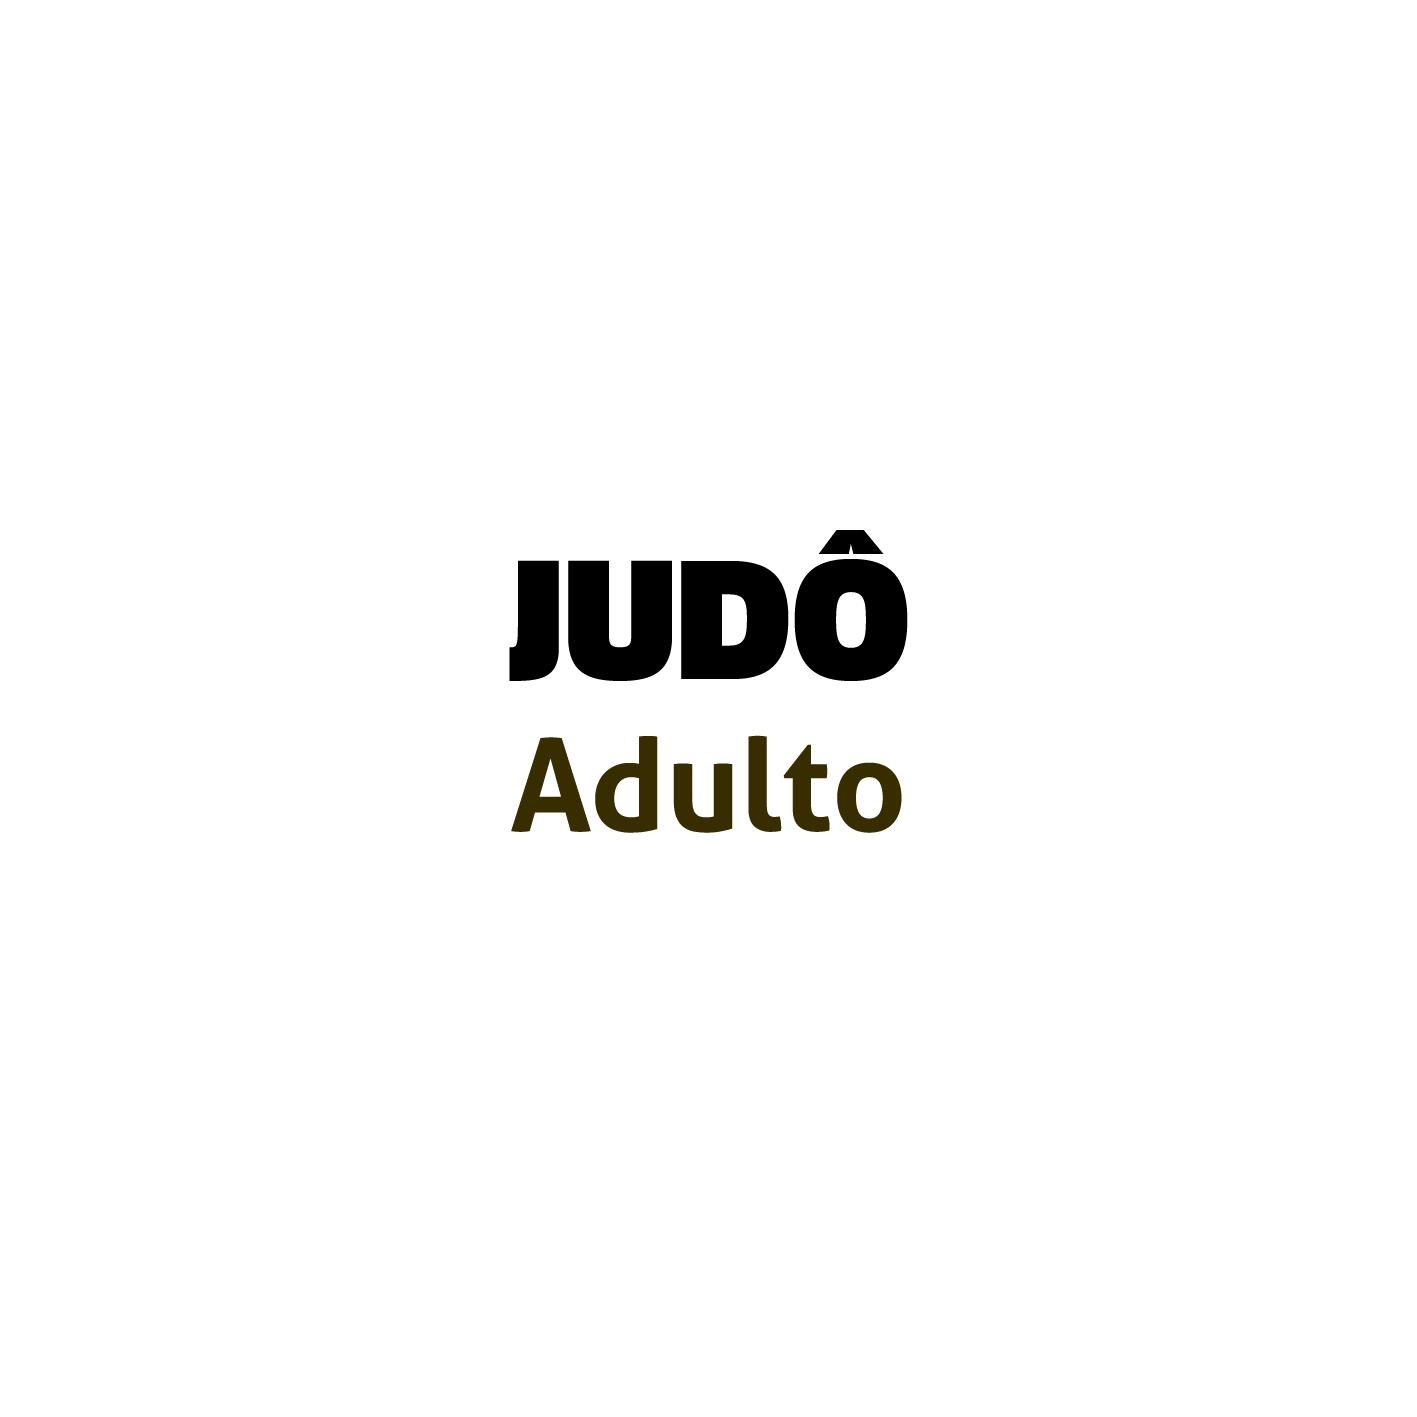 Adulto